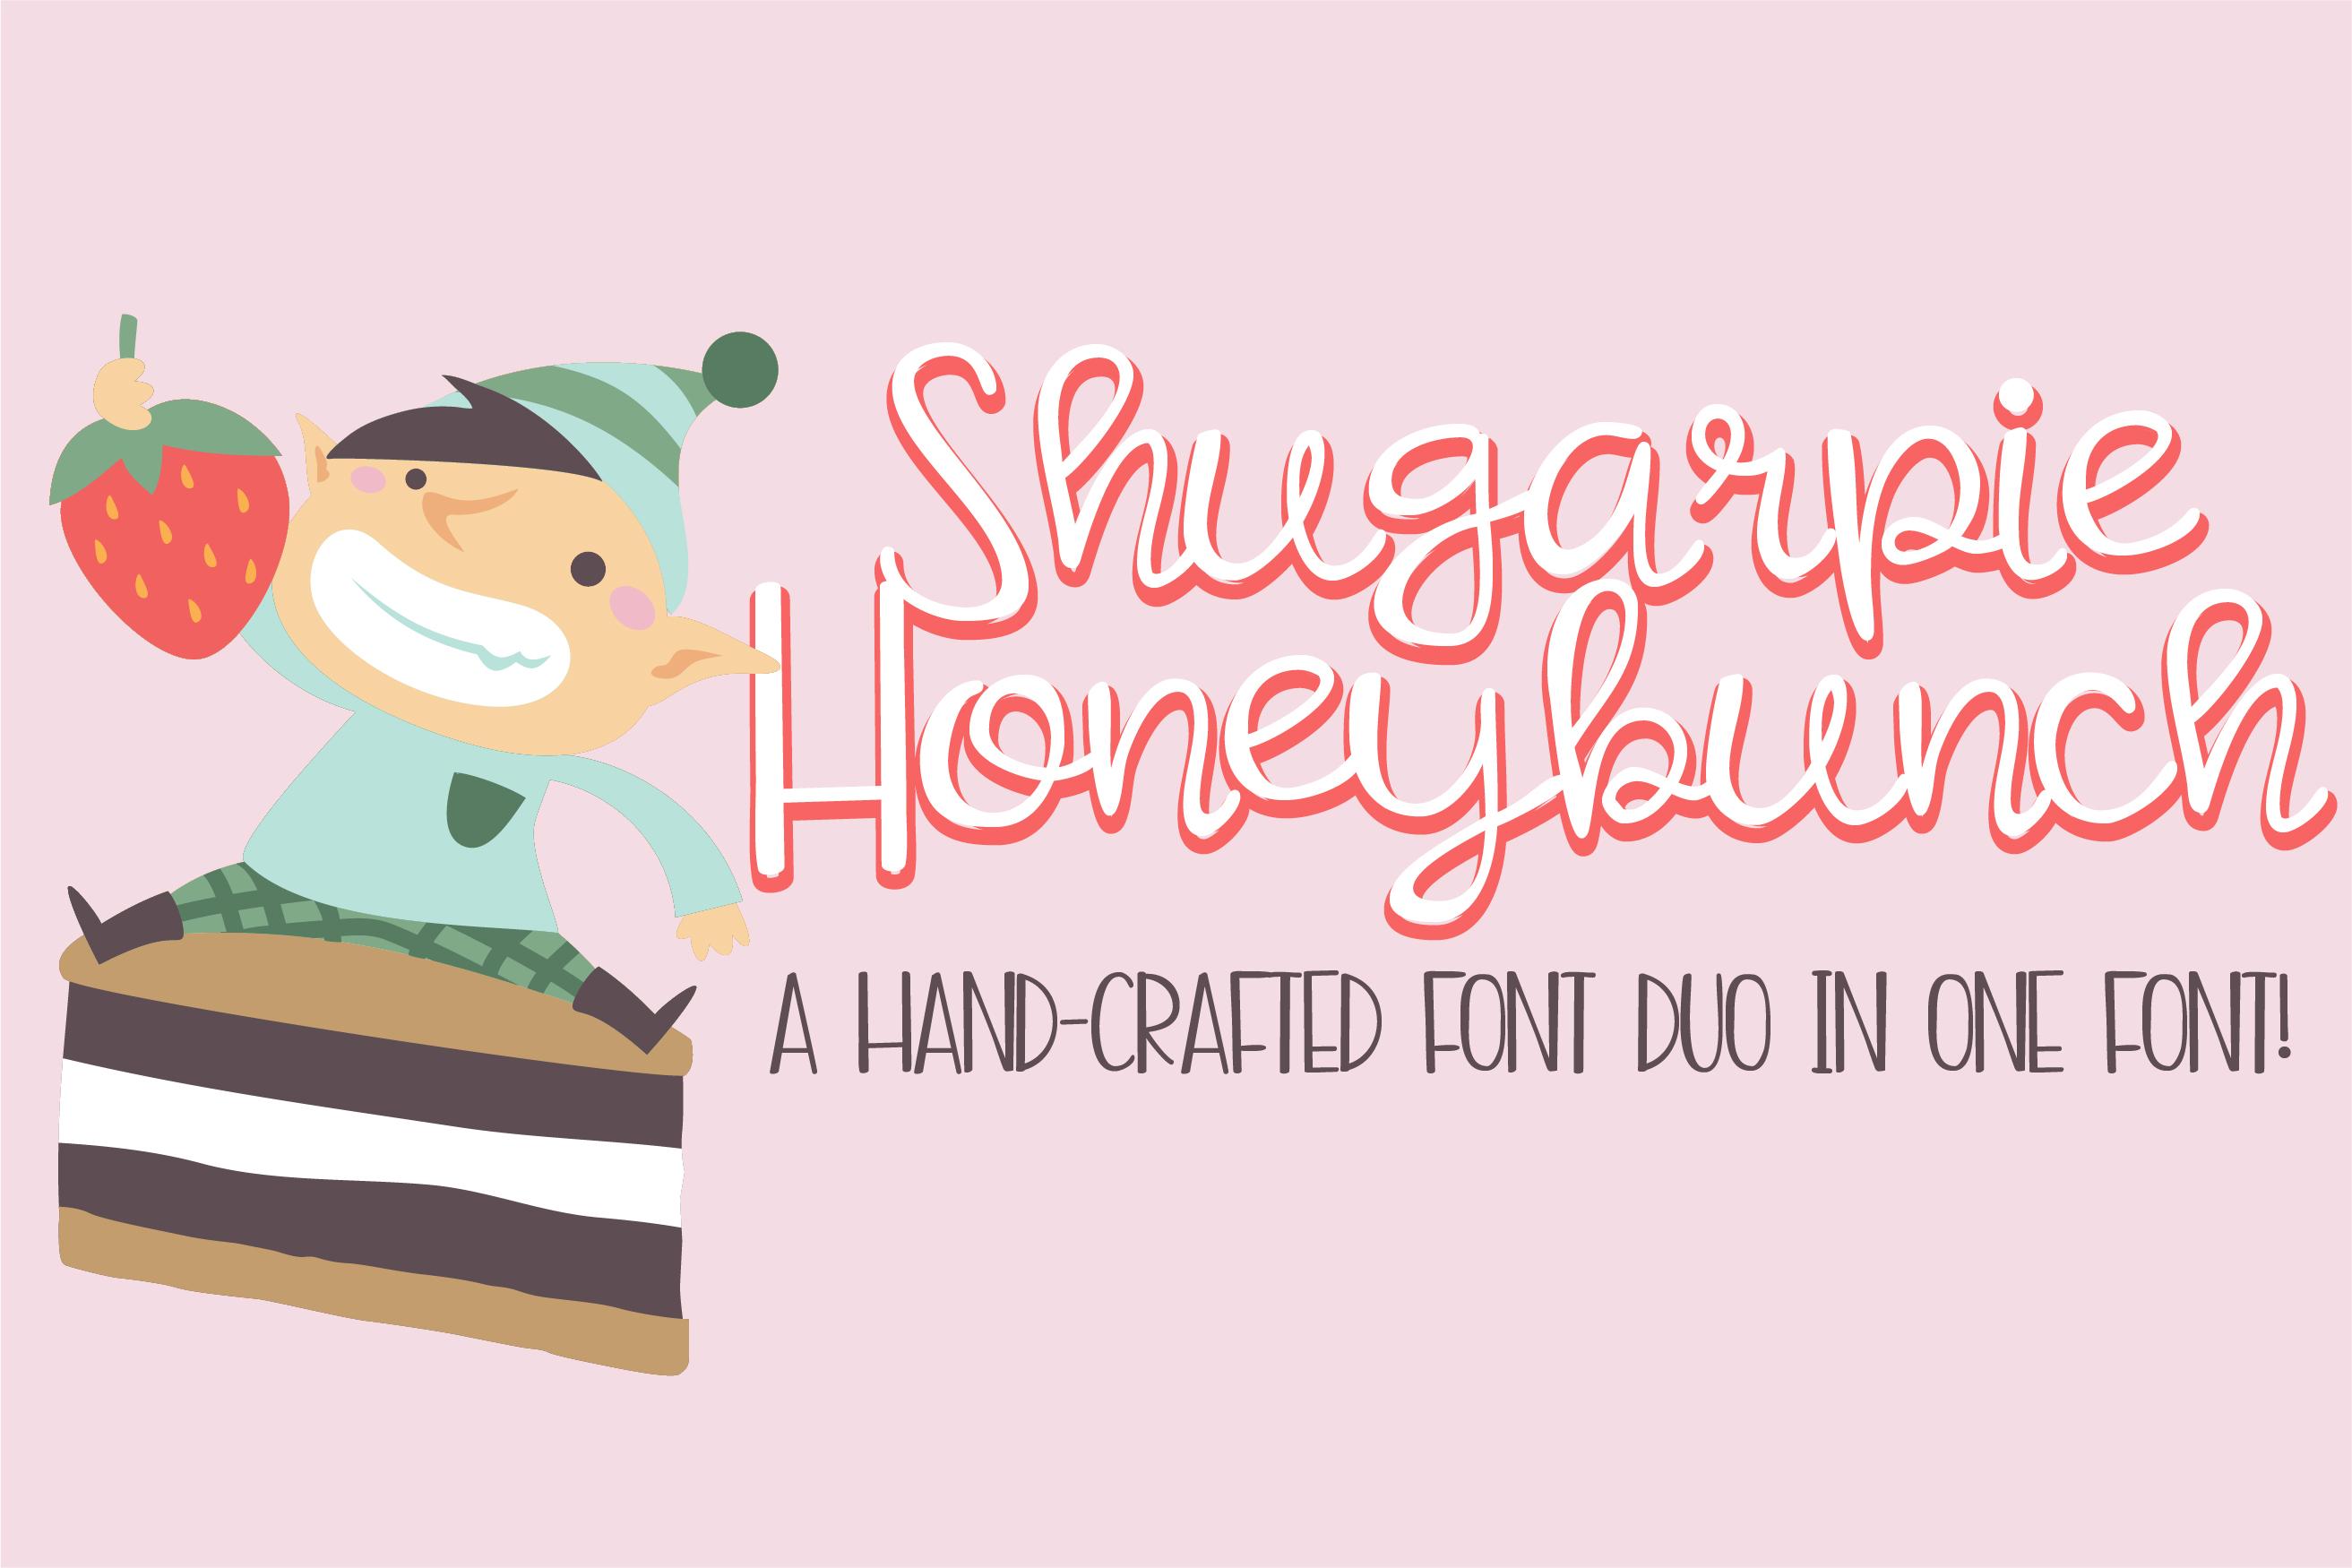 PN Shugarpie Honeybunch example image 1